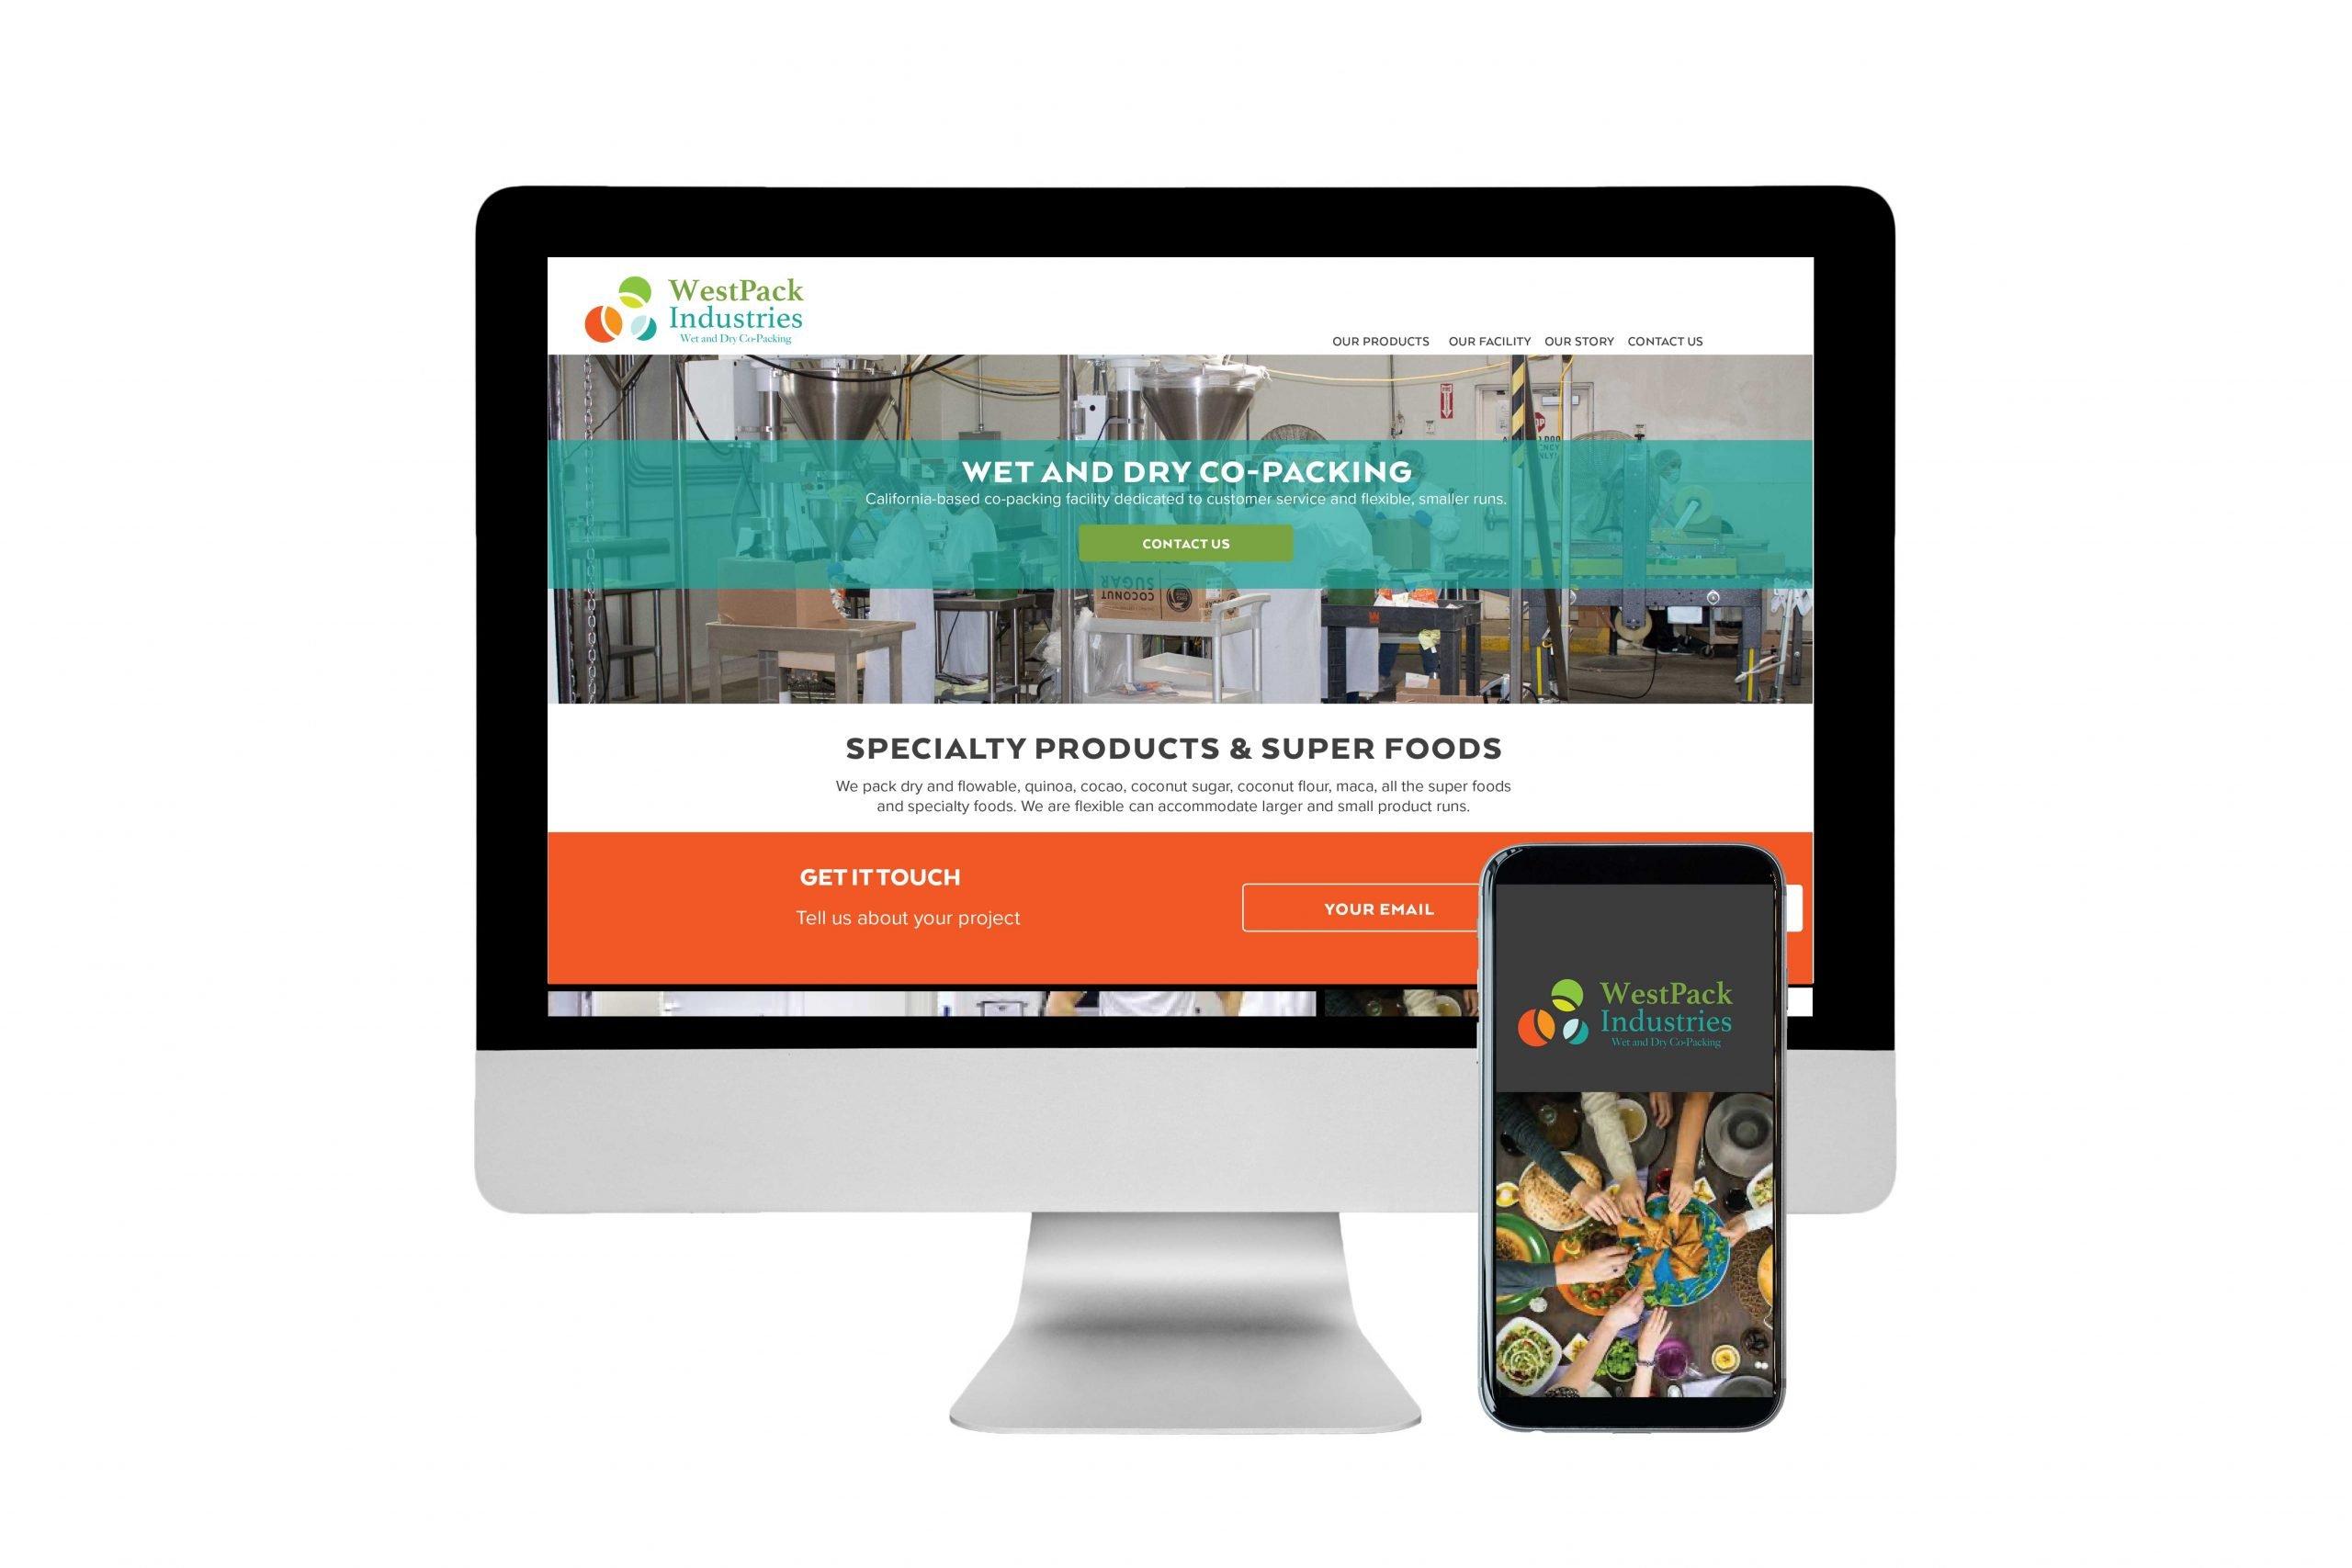 WestPack Industries website design